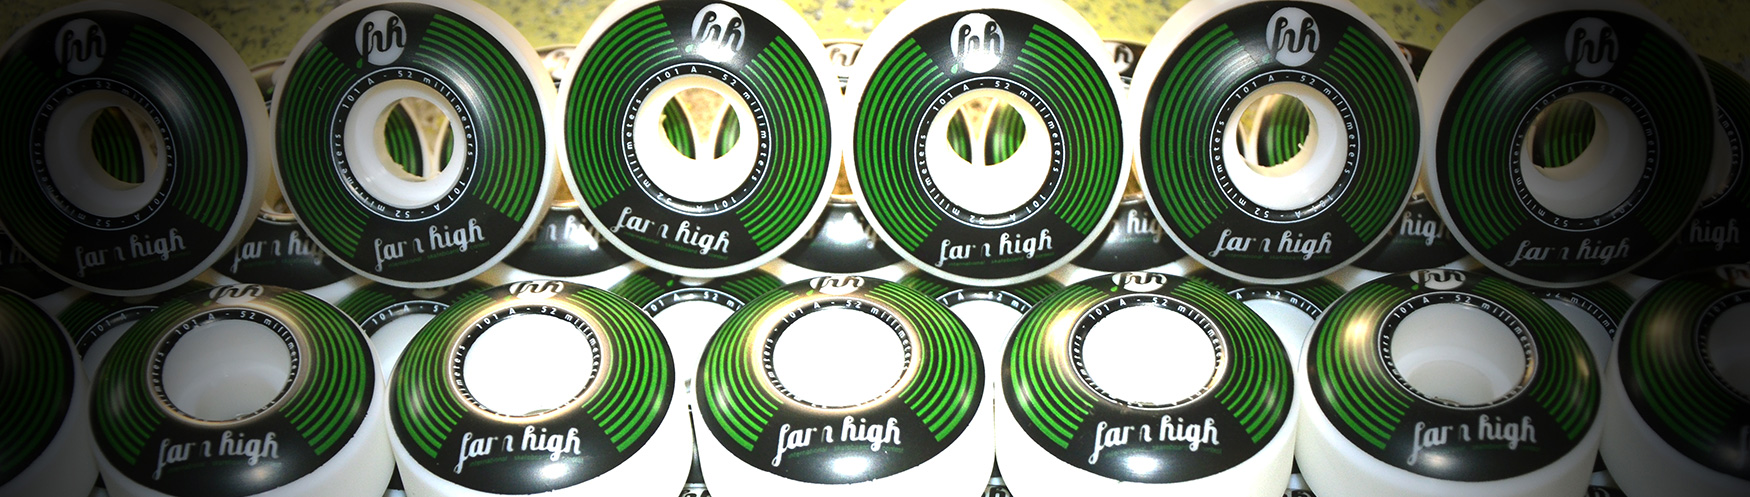 skateboard-custom-wheels